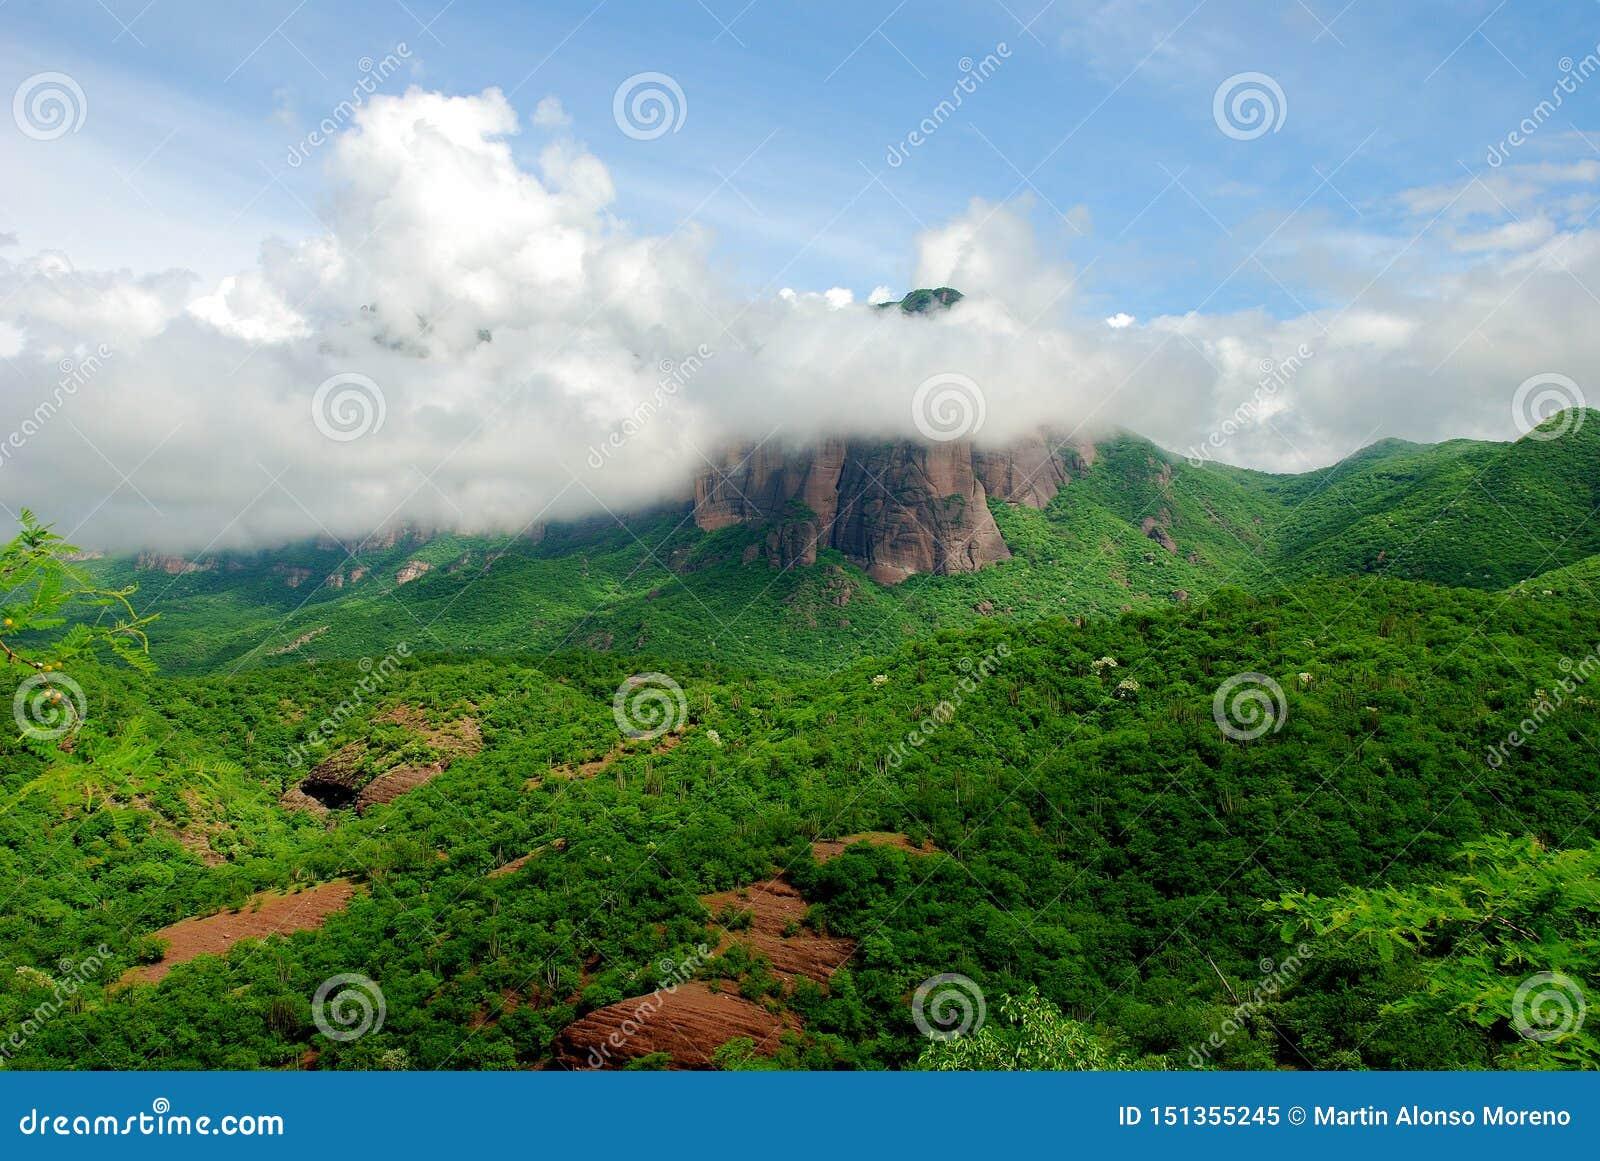 Mountainous landscape of Sierra Madre in Sinaloa Mexico.